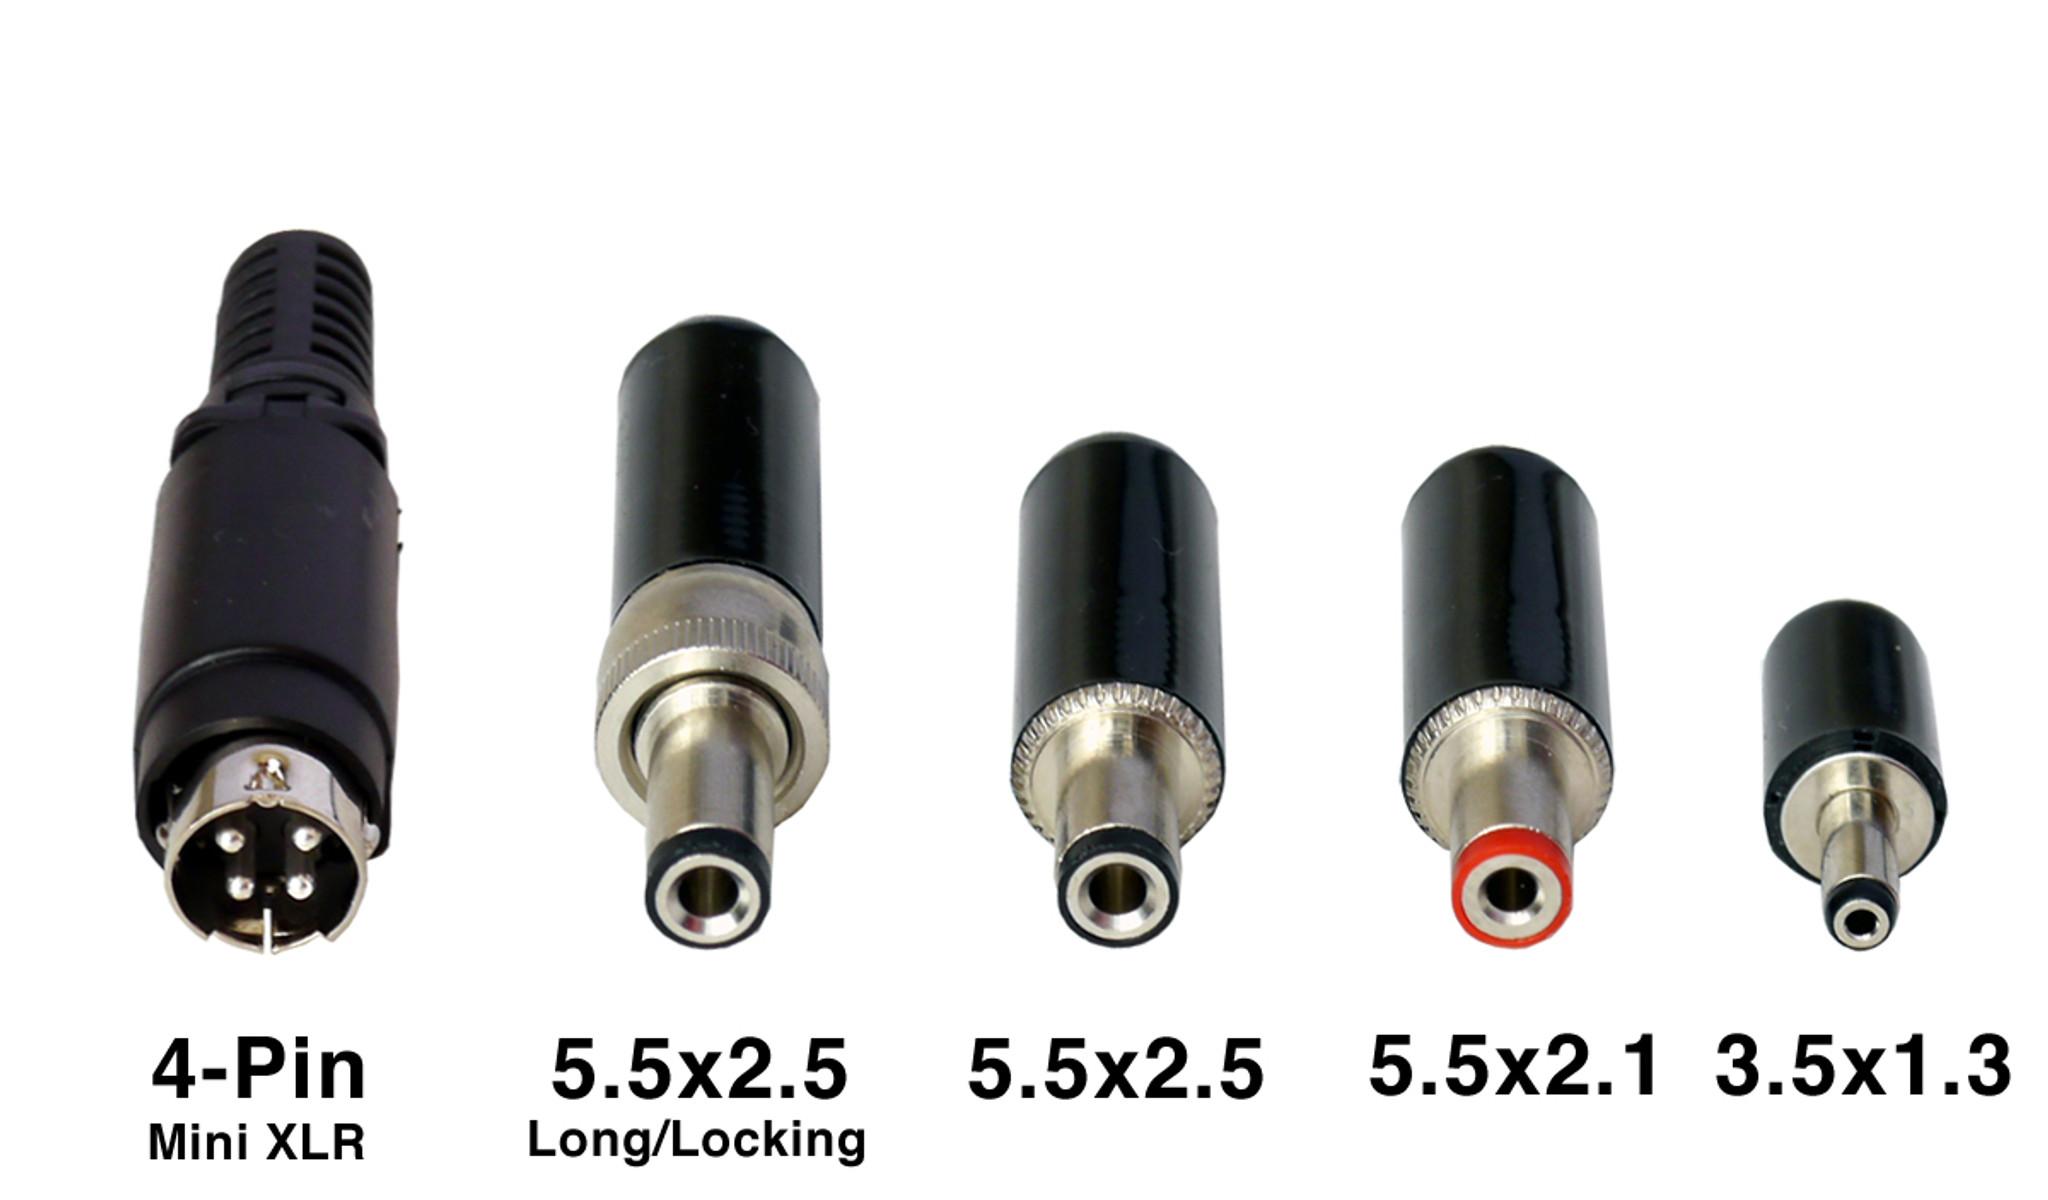 medium resolution of dc plug options and sizes